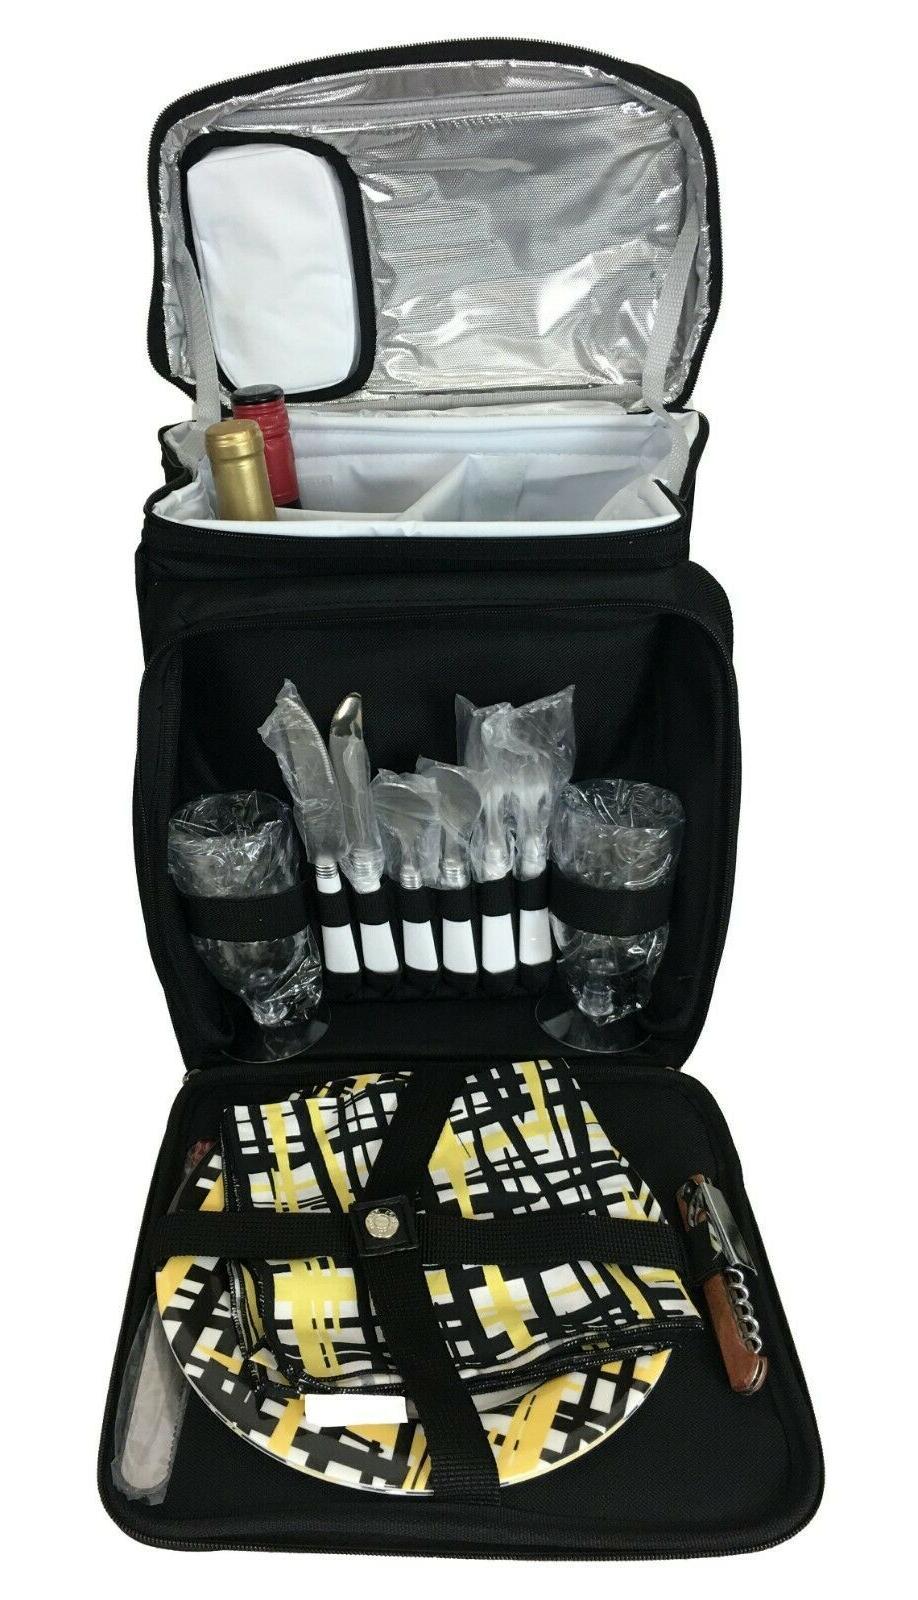 paris picnic cooler backpack for 2 wine